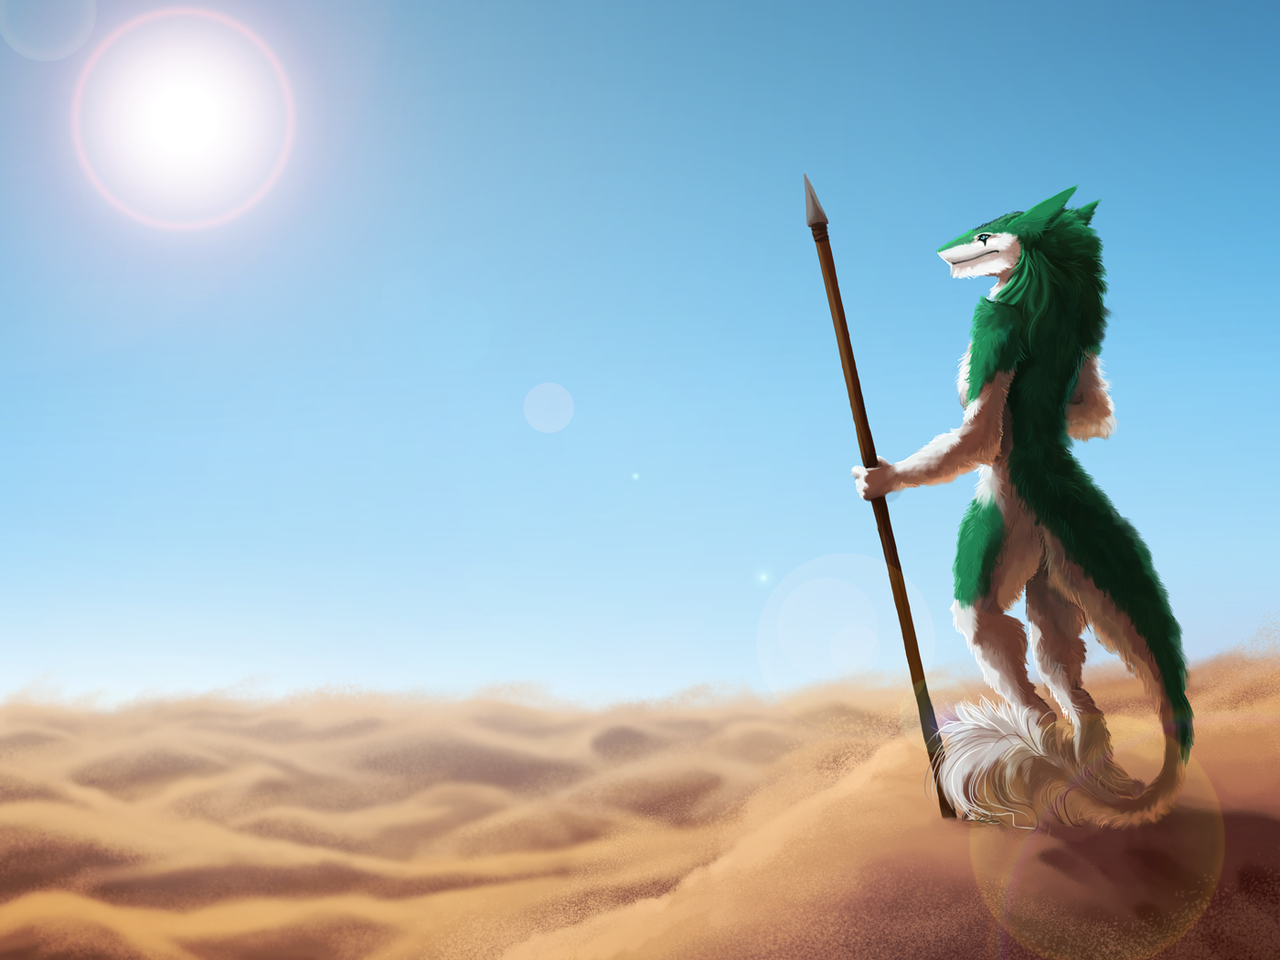 Desert Sun by Kampfkewob